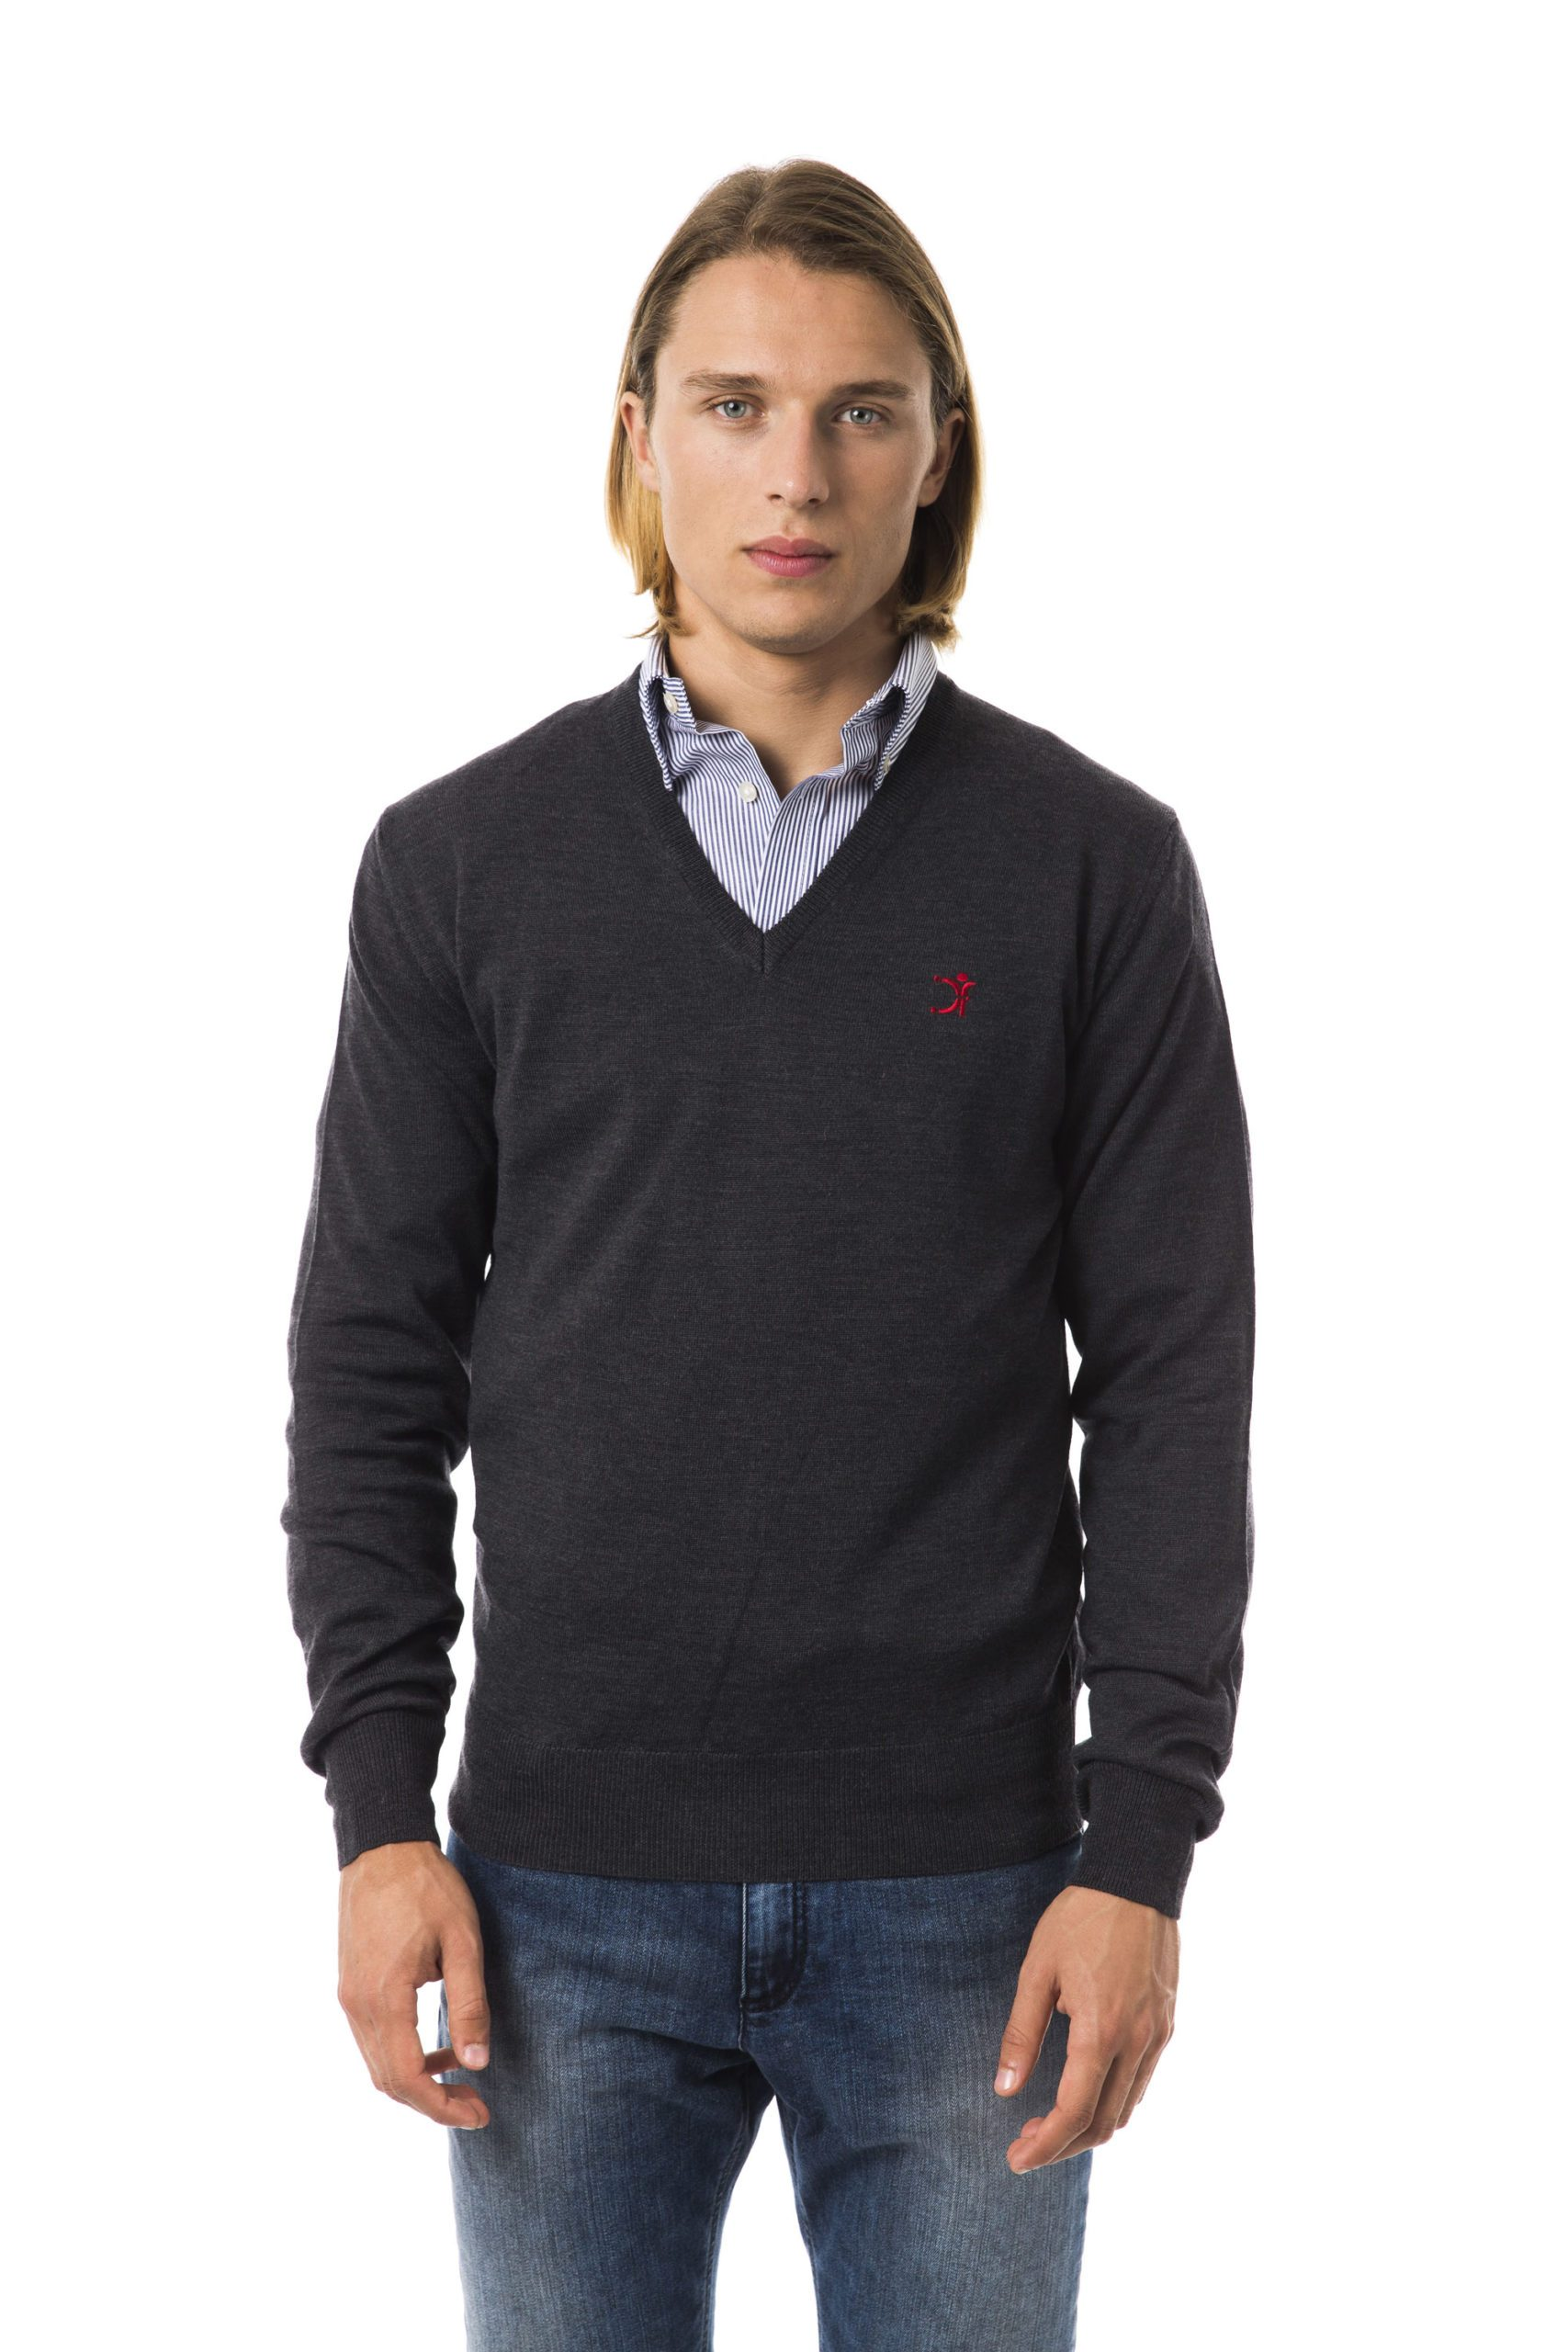 Uominitaliani Men's Antr Sweater Gray UO816733 - S